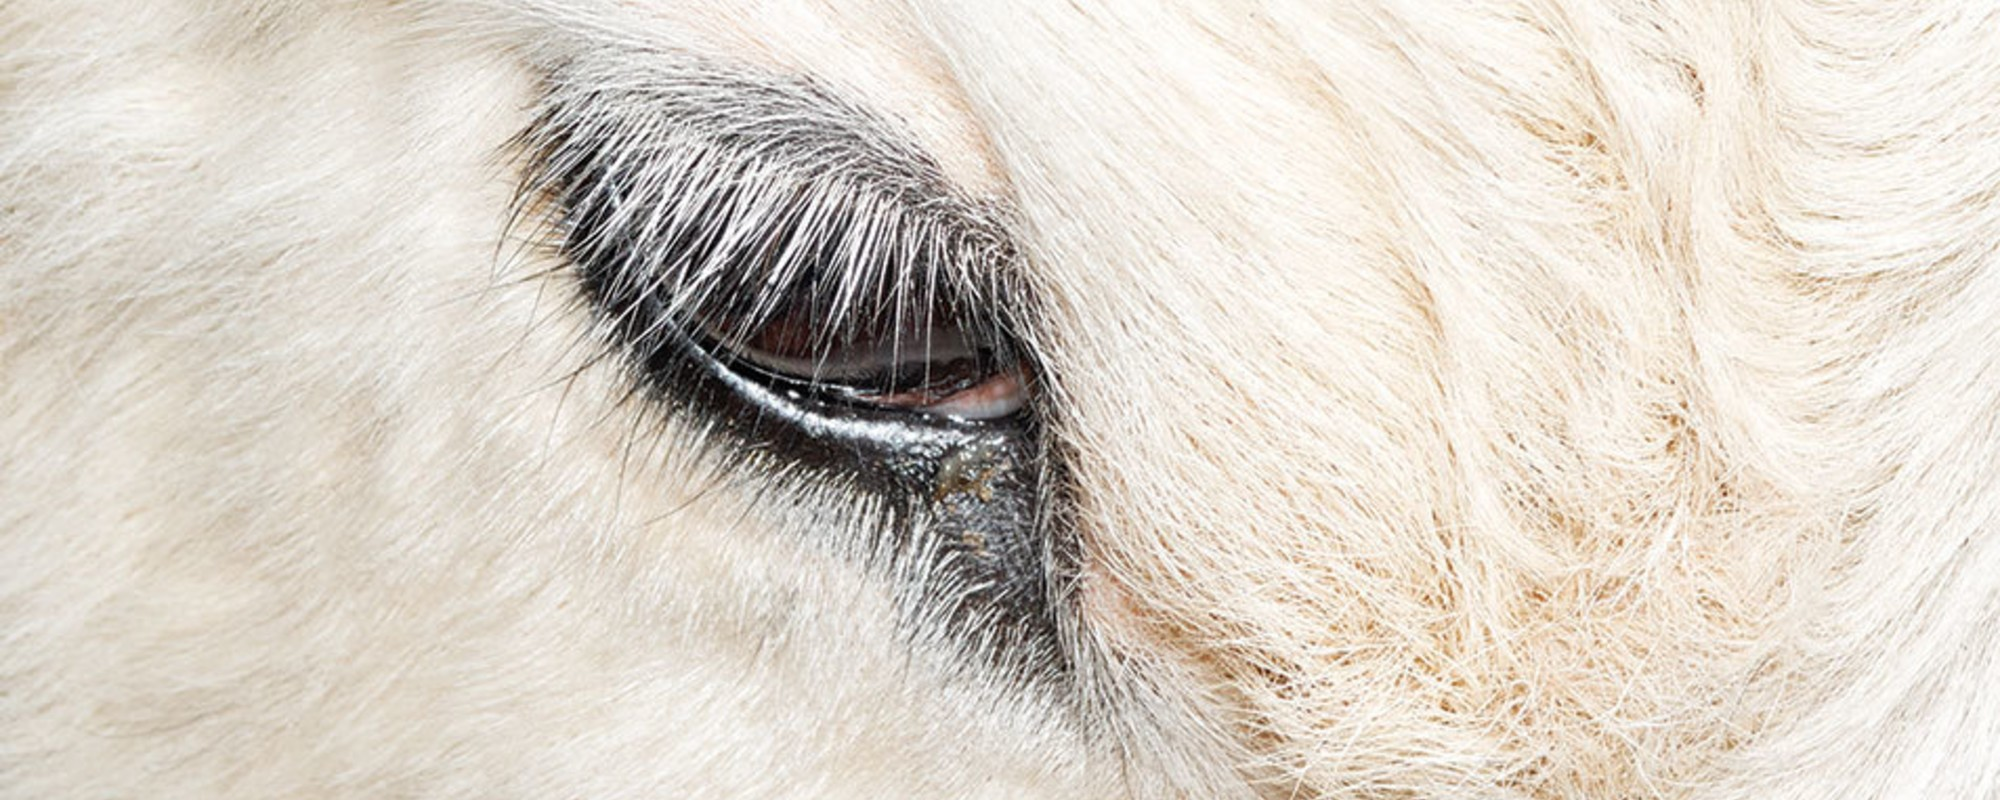 The Holy Cow Issue – Die Geschichte hinter dem Cover